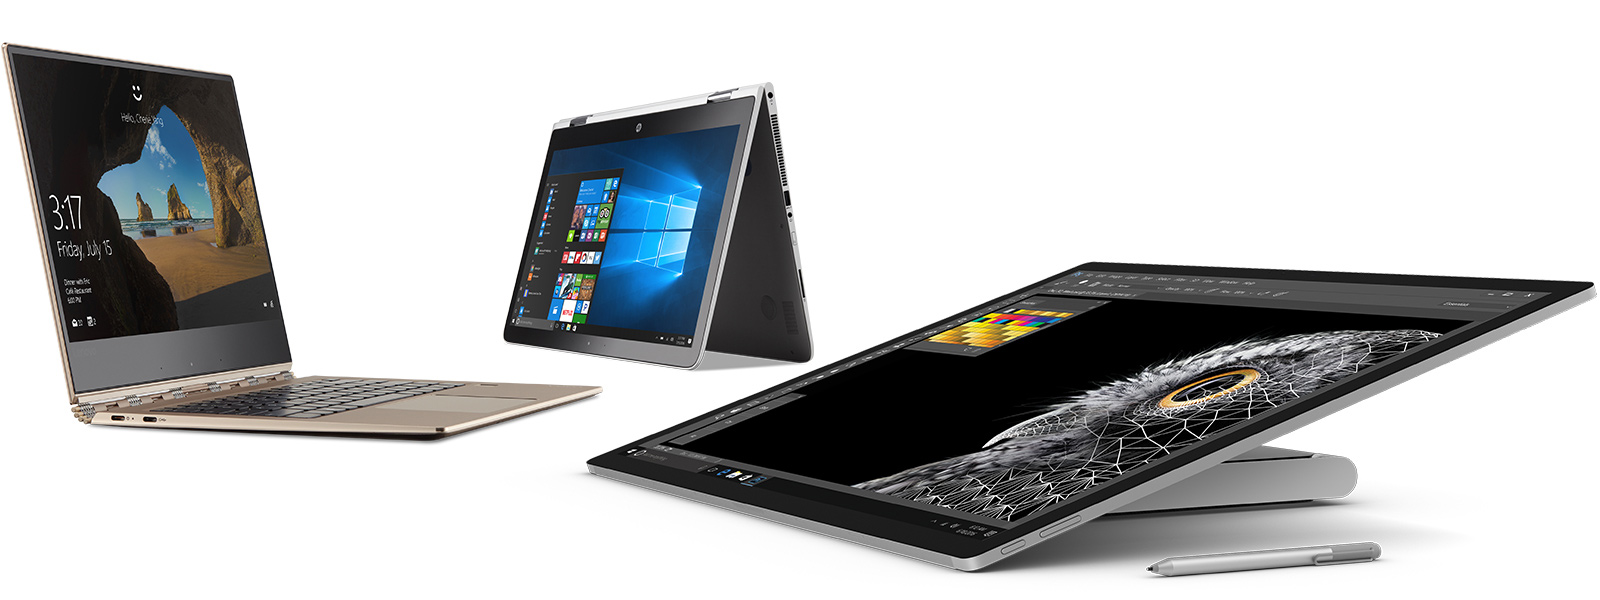 Group image HP Spectre, Lenovo Yoga and Surface Studio.